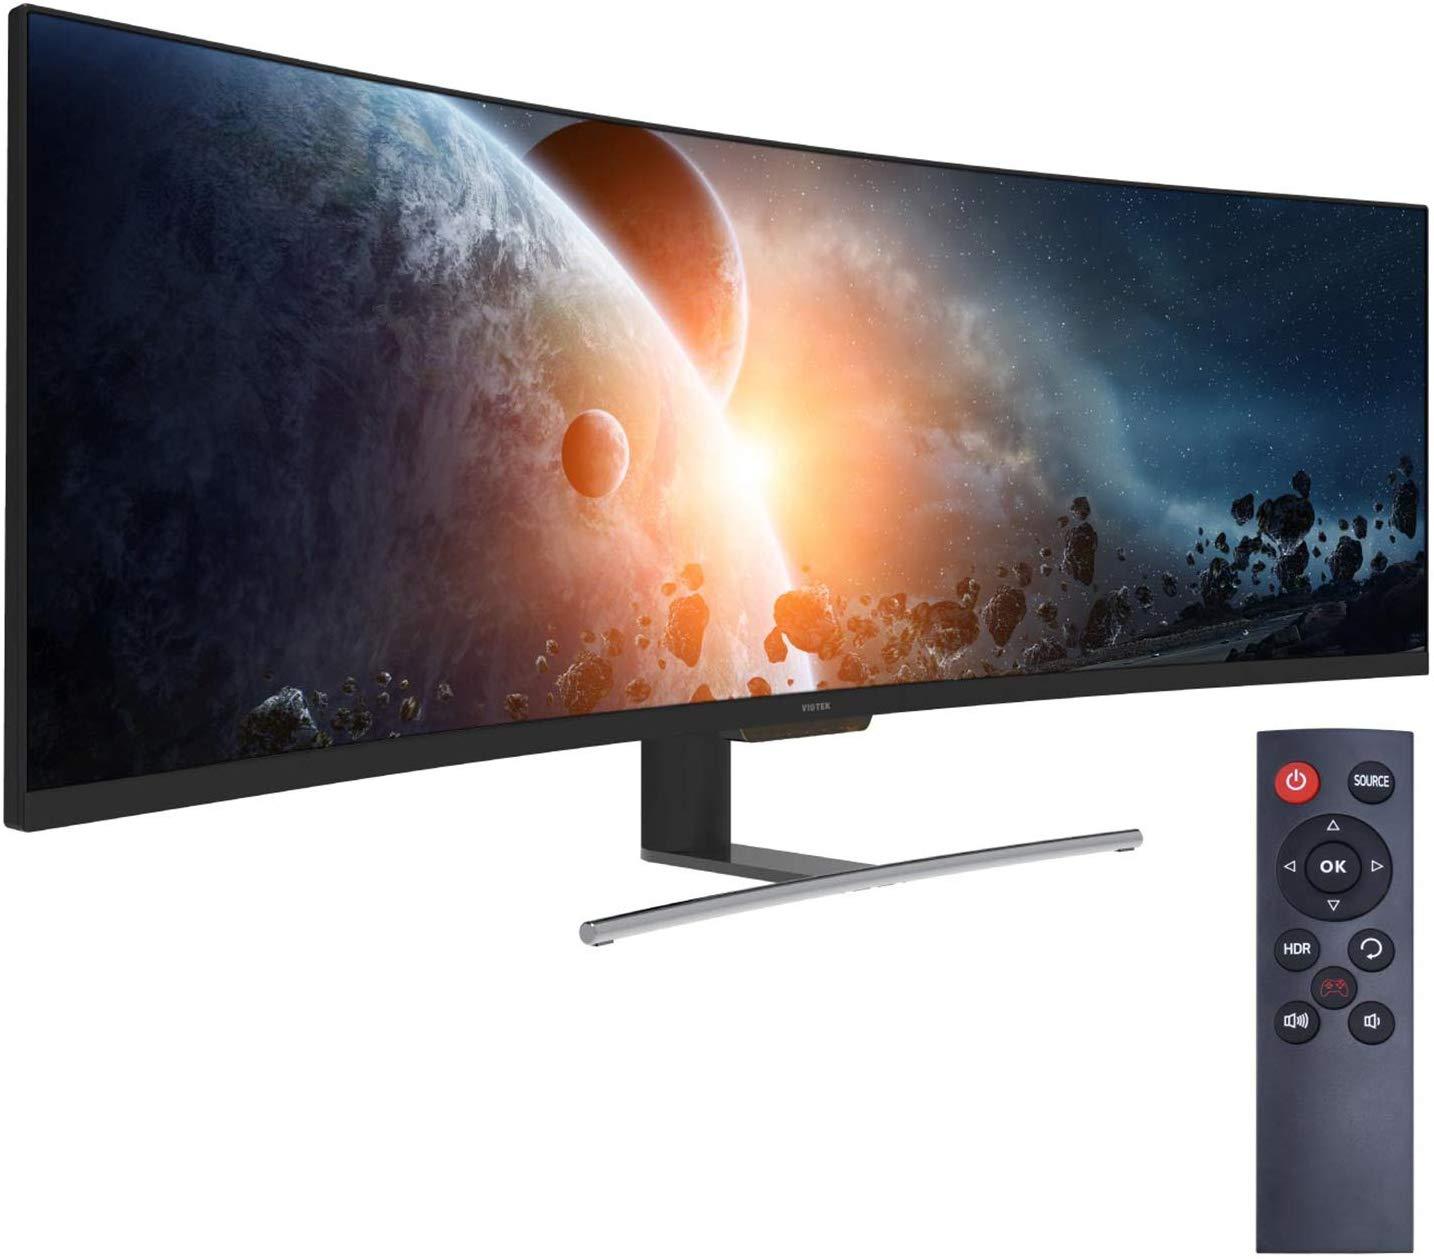 Best 49-inch Super Ultrawide Monitors (Reviewed December 2019) 7